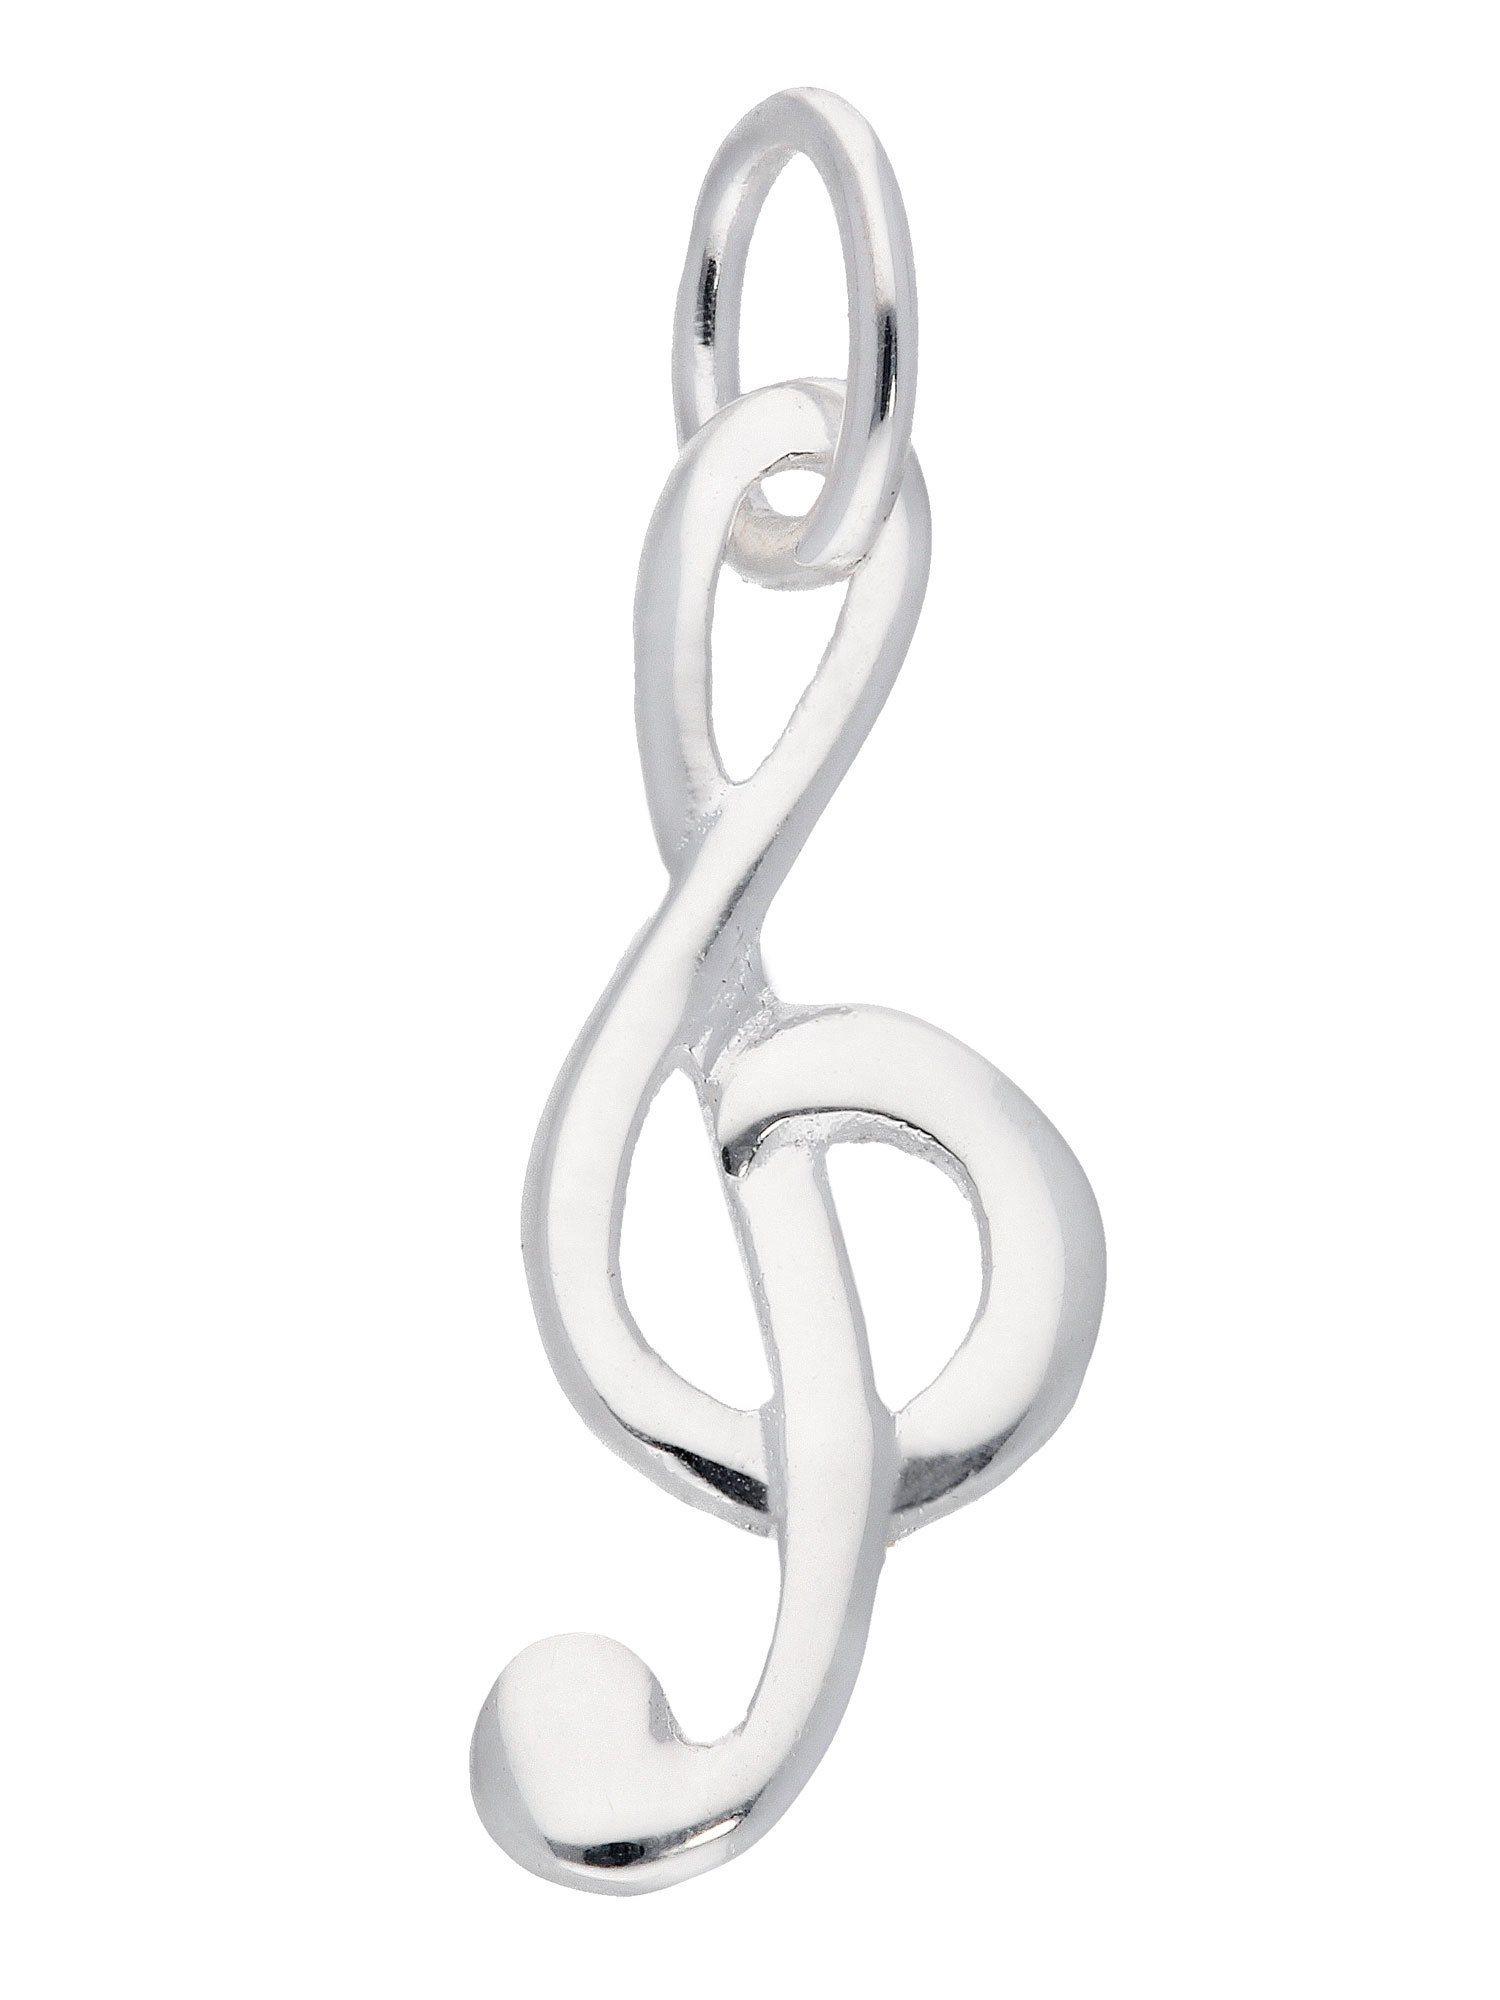 Adelia´s Kettenanhänger »Silber Anhänger« Notenschlüssel 925 Sterling Silber | Schmuck > Halsketten > Ketten ohne Anhänger | Silber | Adelia´s